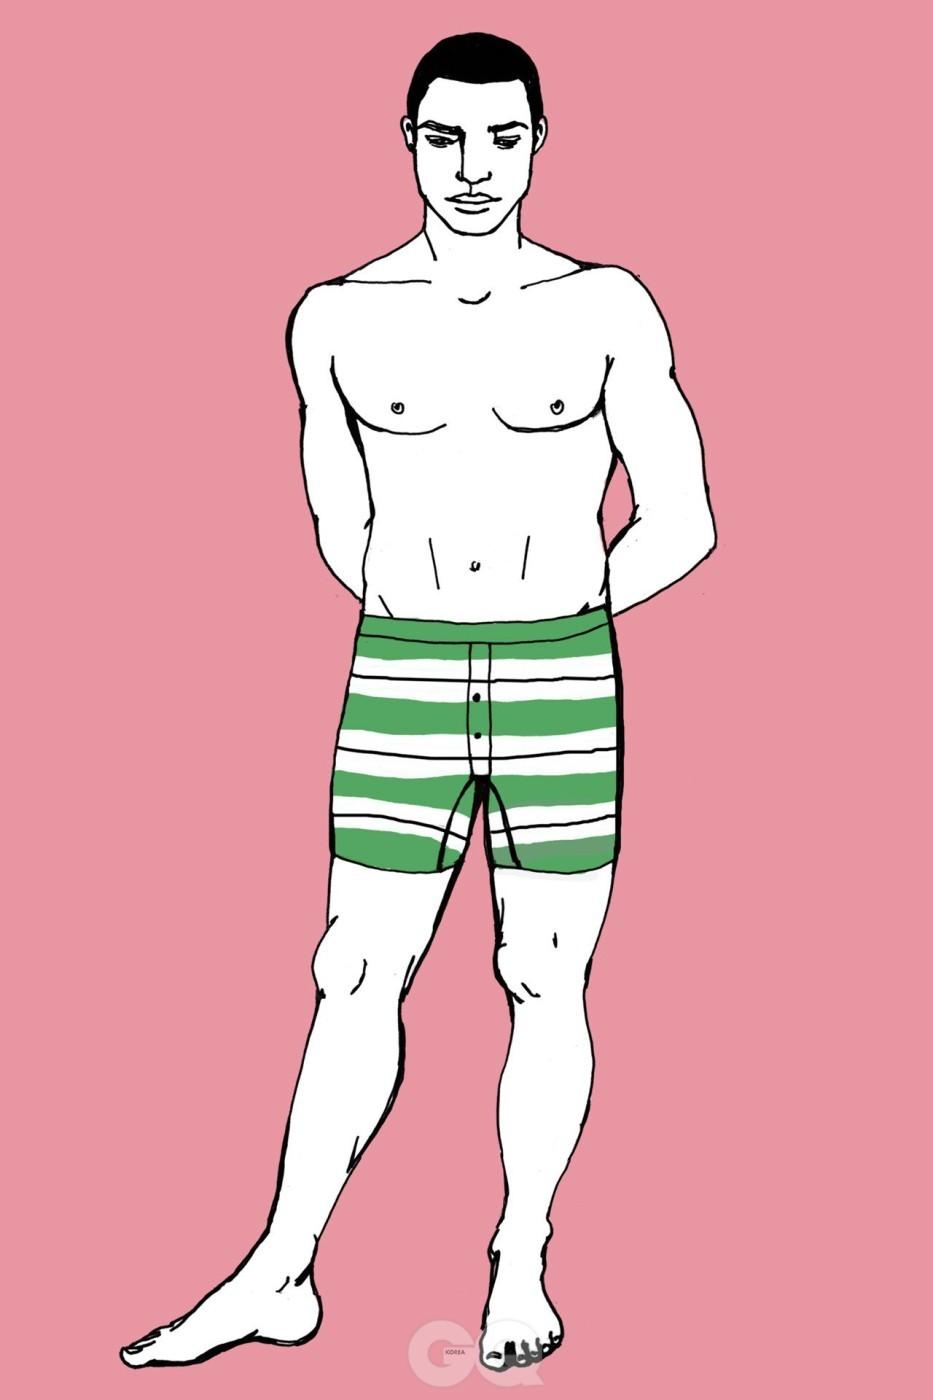 5e82b174331 마른 실루엣의 남성복이 인기를 끌면서 박서-브리프는 많은 남자들이 가장 선호하는 속옷이 되었다. 입었을 때 브리프처럼 너무 티가 ...